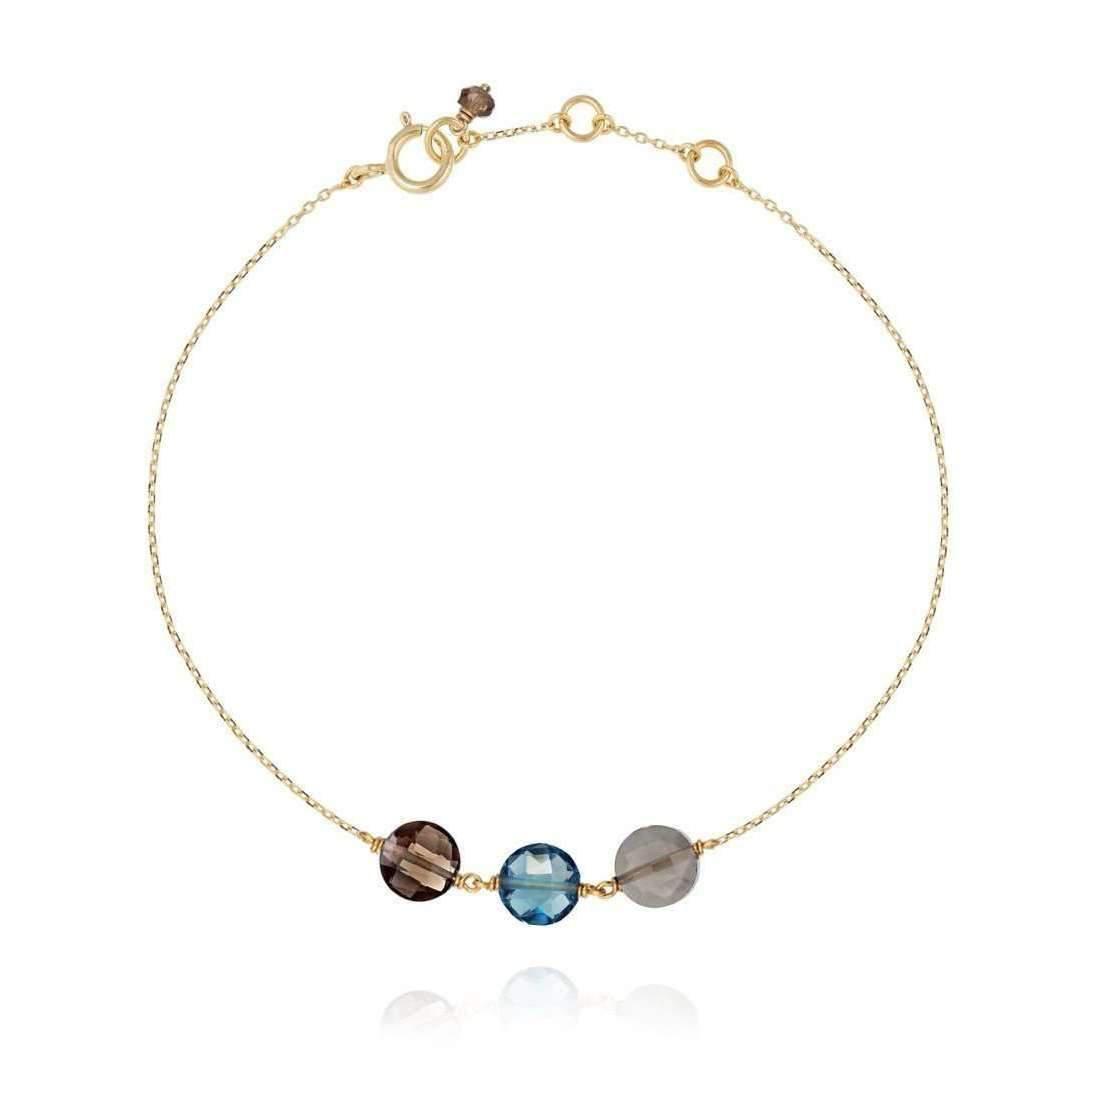 Perle de lune Trio Gemstones Bracelet Blue 18kt Gold NRQNV